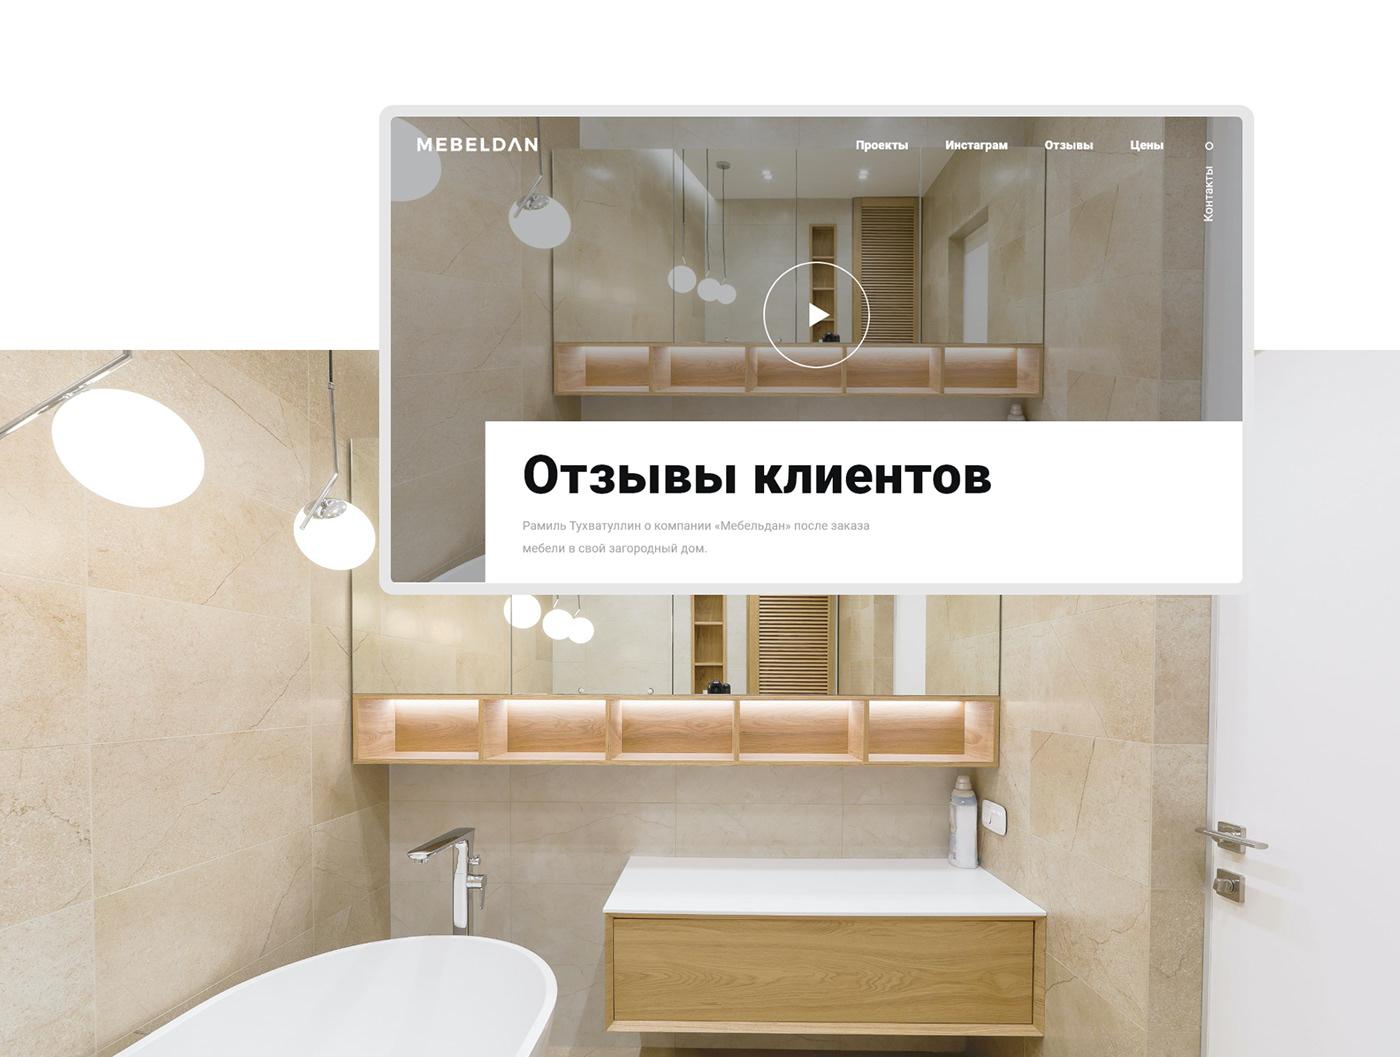 brand furniture interaction Interior mebeldan Minimalism UI ux Website xD